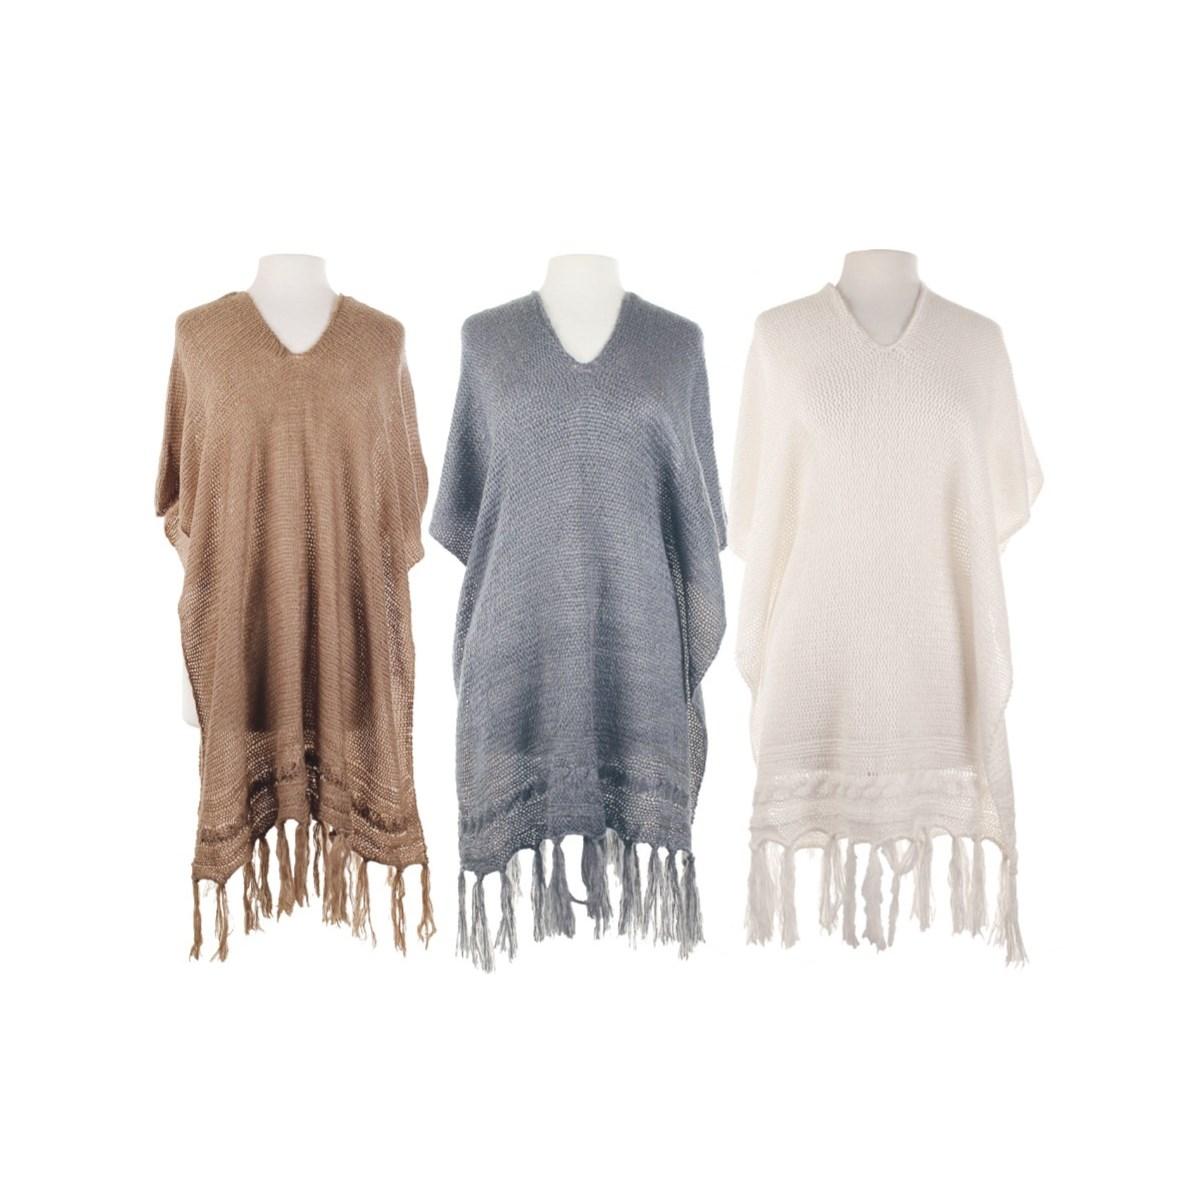 Cheyenne Wrap Collection